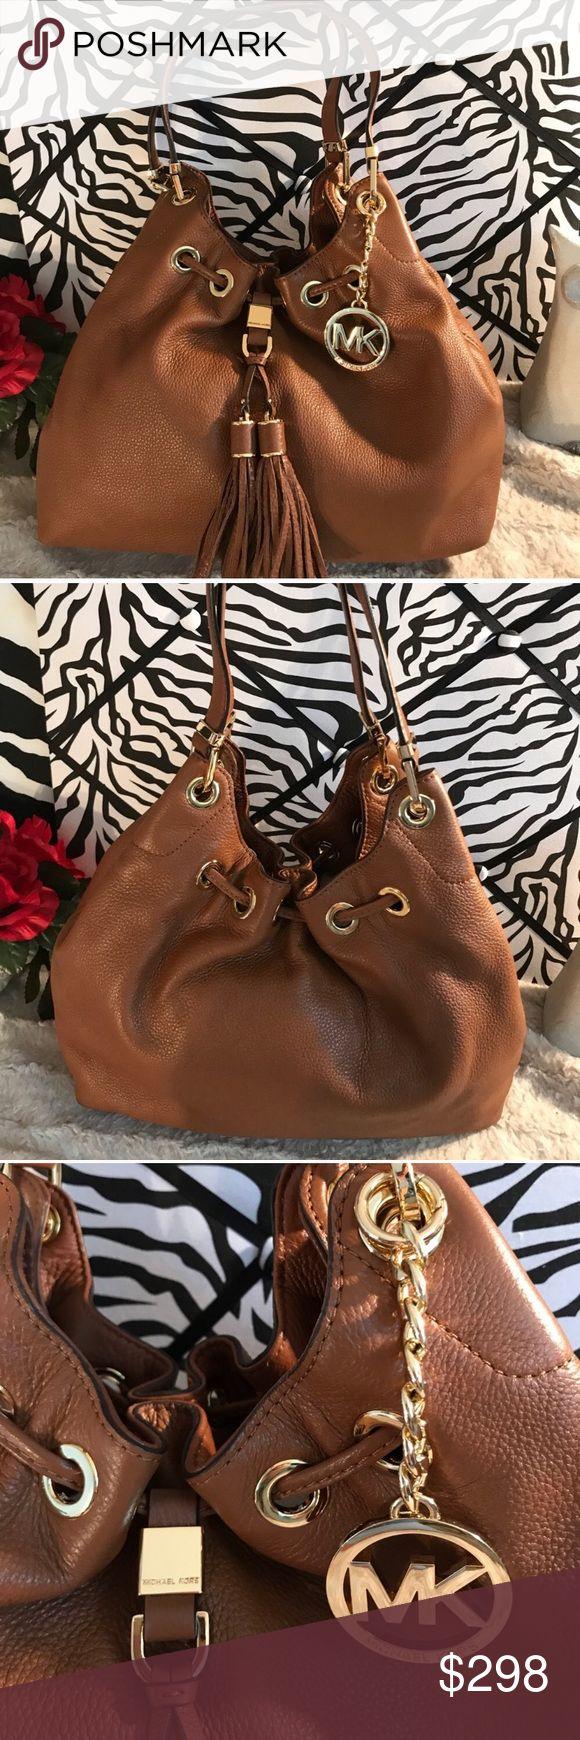 NWOT Michael Kors bag NWOT Brown leather Michael Kors bag. TV is retail value. MICHAEL Michael Kors Bags